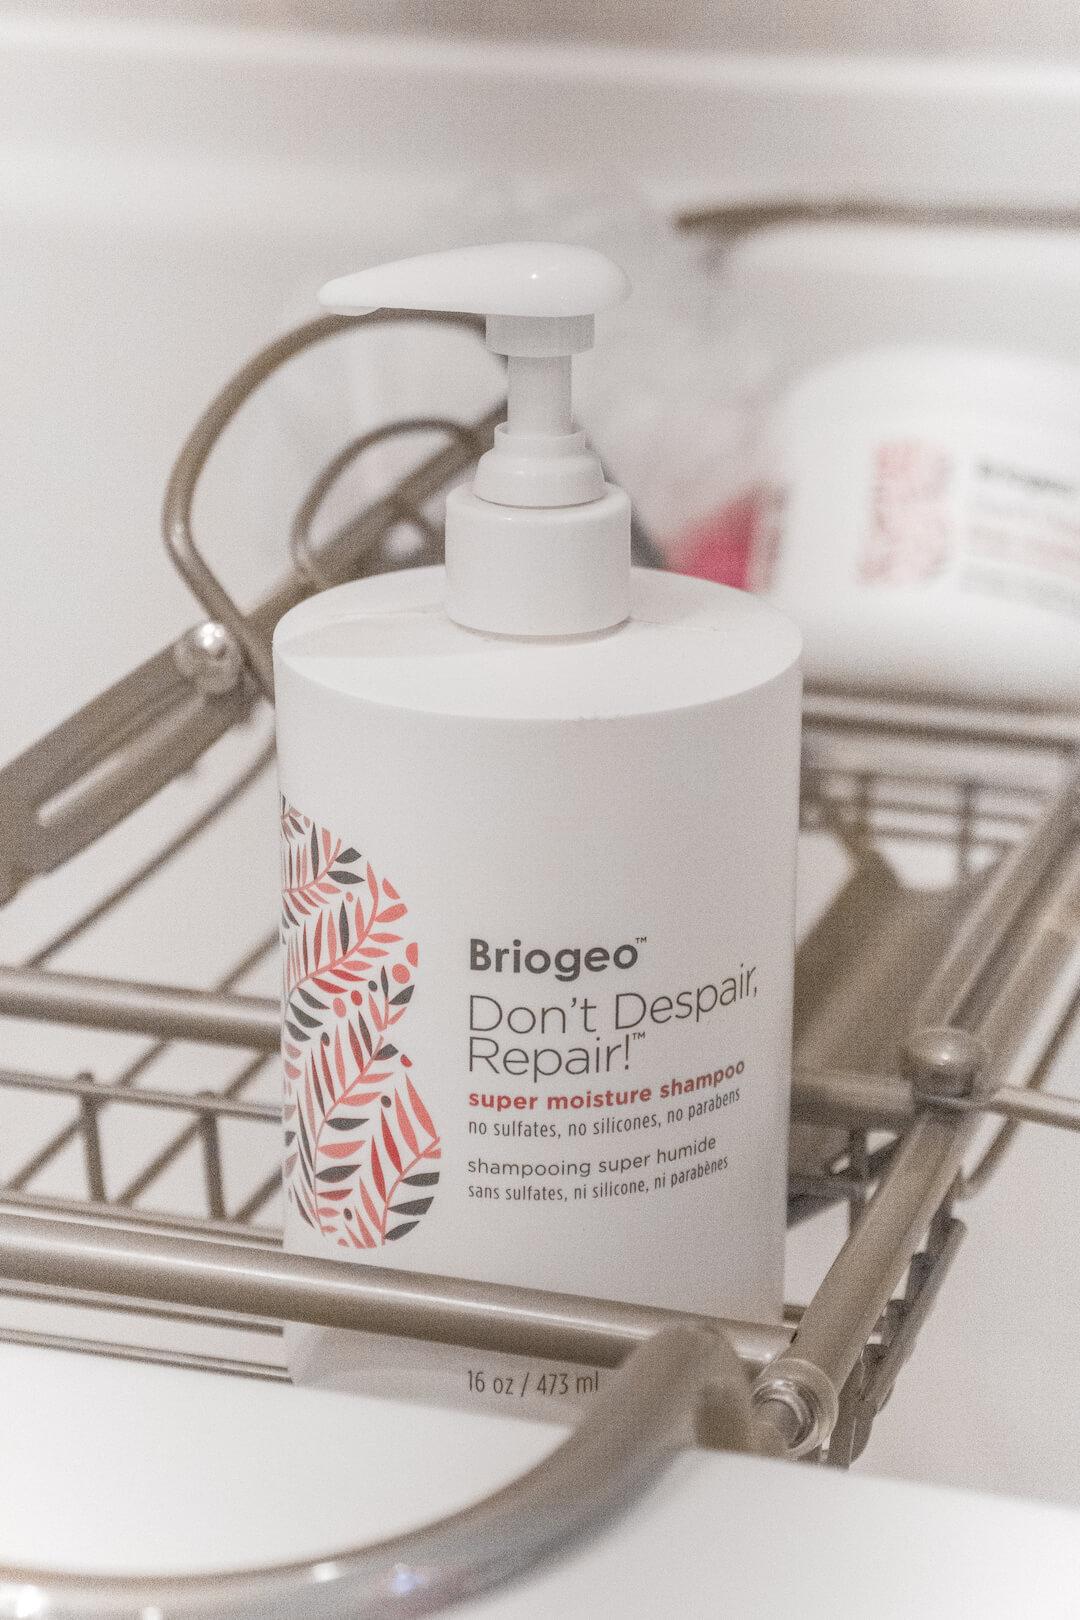 briogeo-dont-despair-repair-shampoo-review